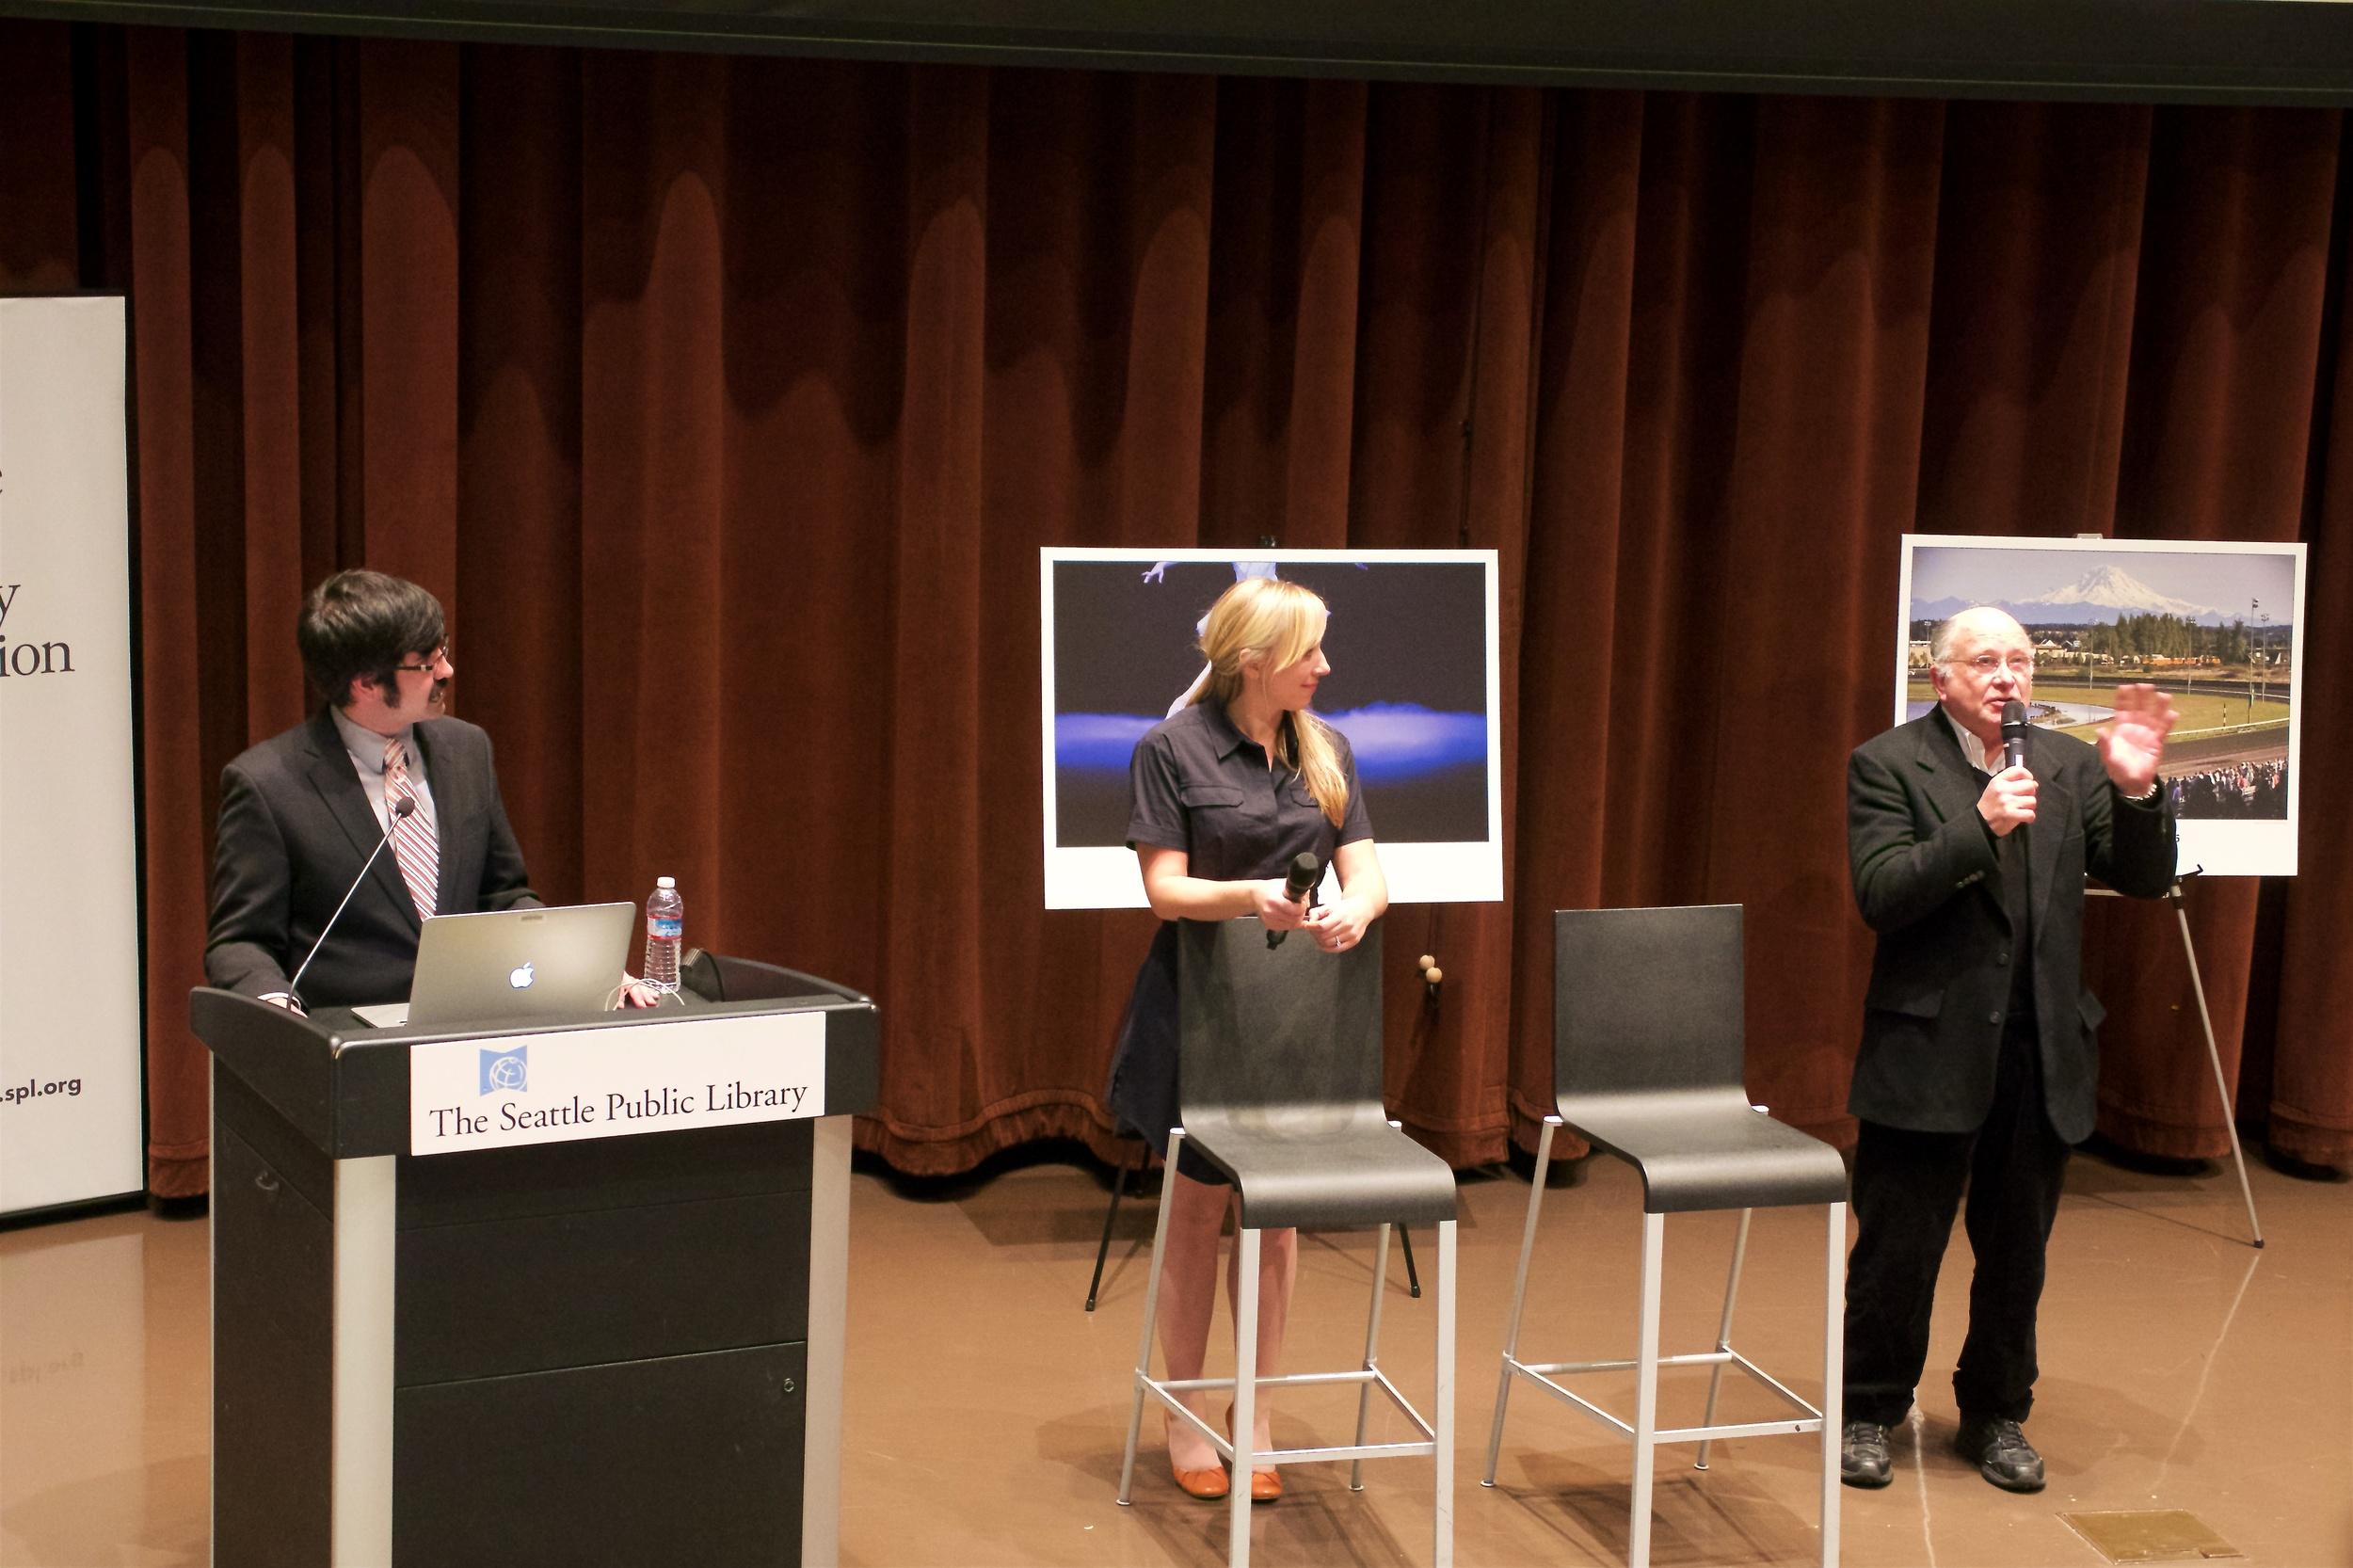 Danny Gawlowski, Erika Schultz, and Greg Gilbert answering questions